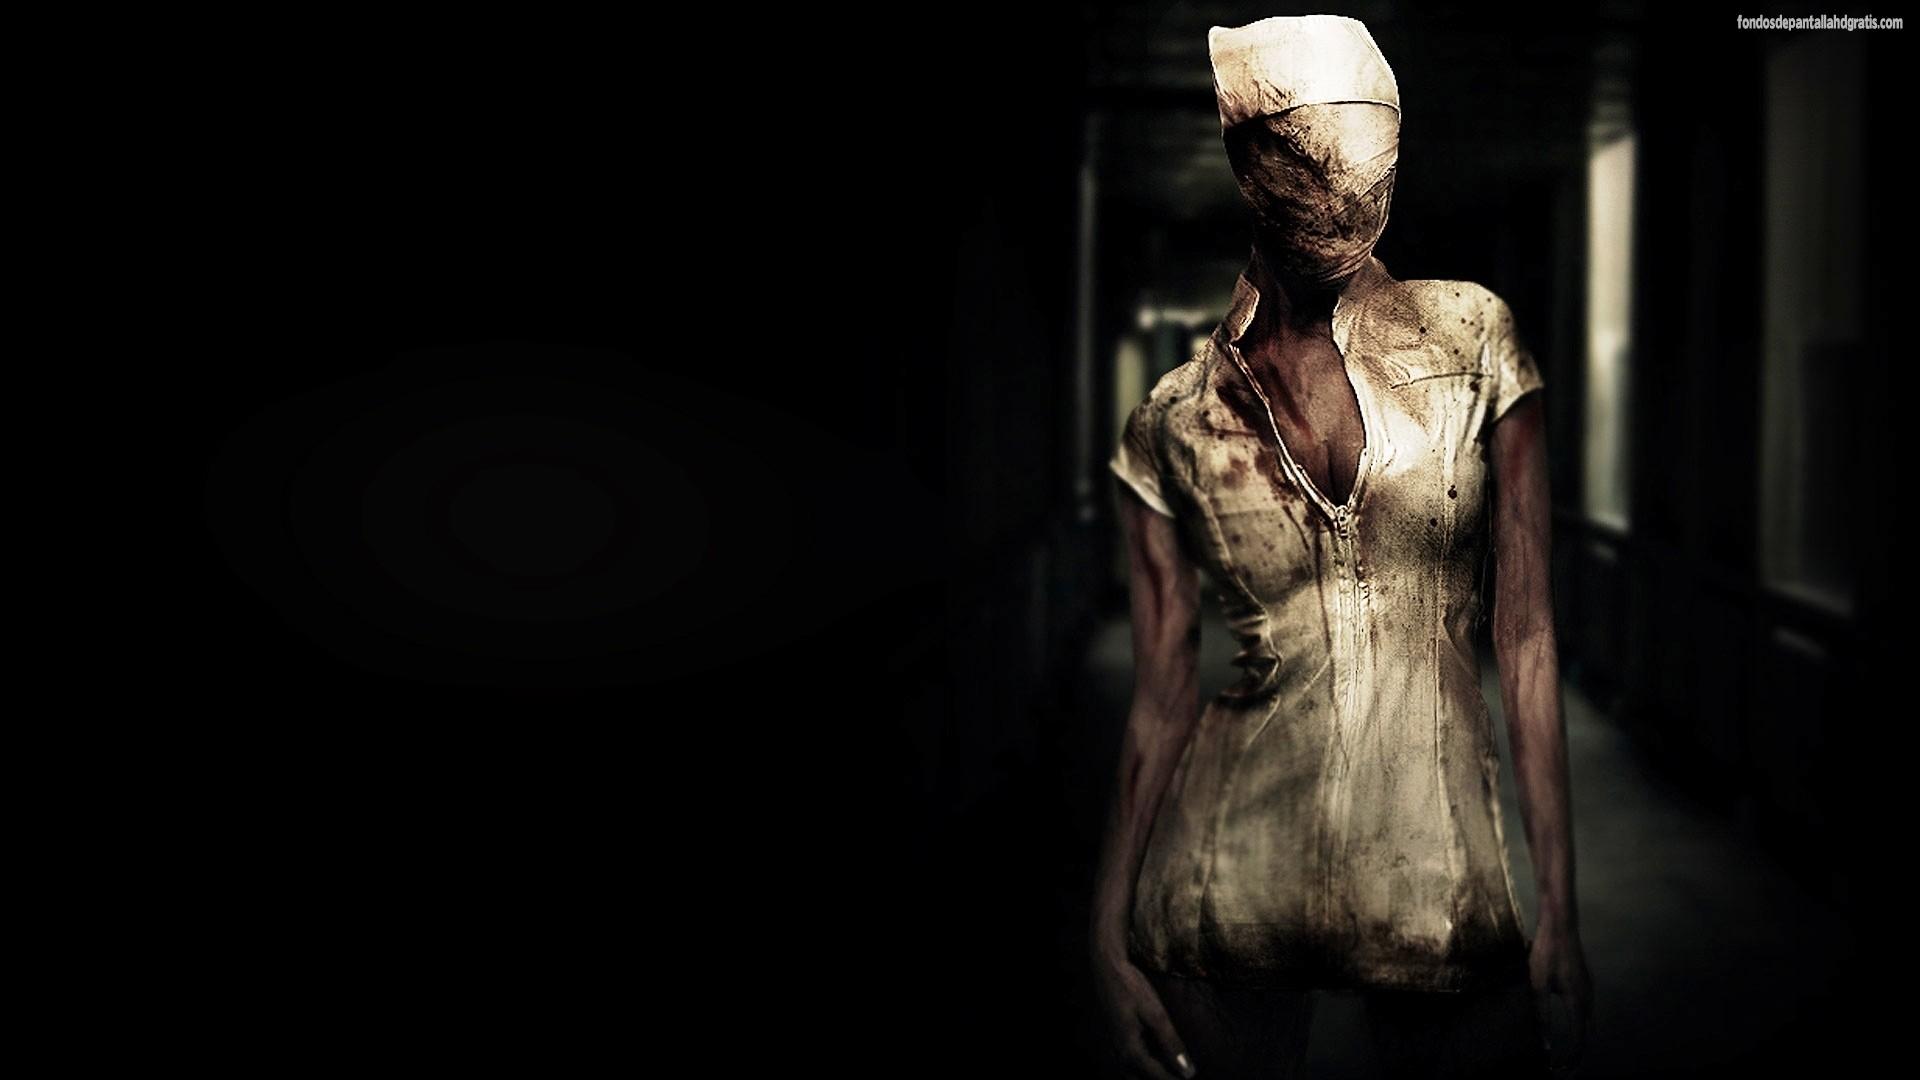 Silent Hill, hola enfermera.